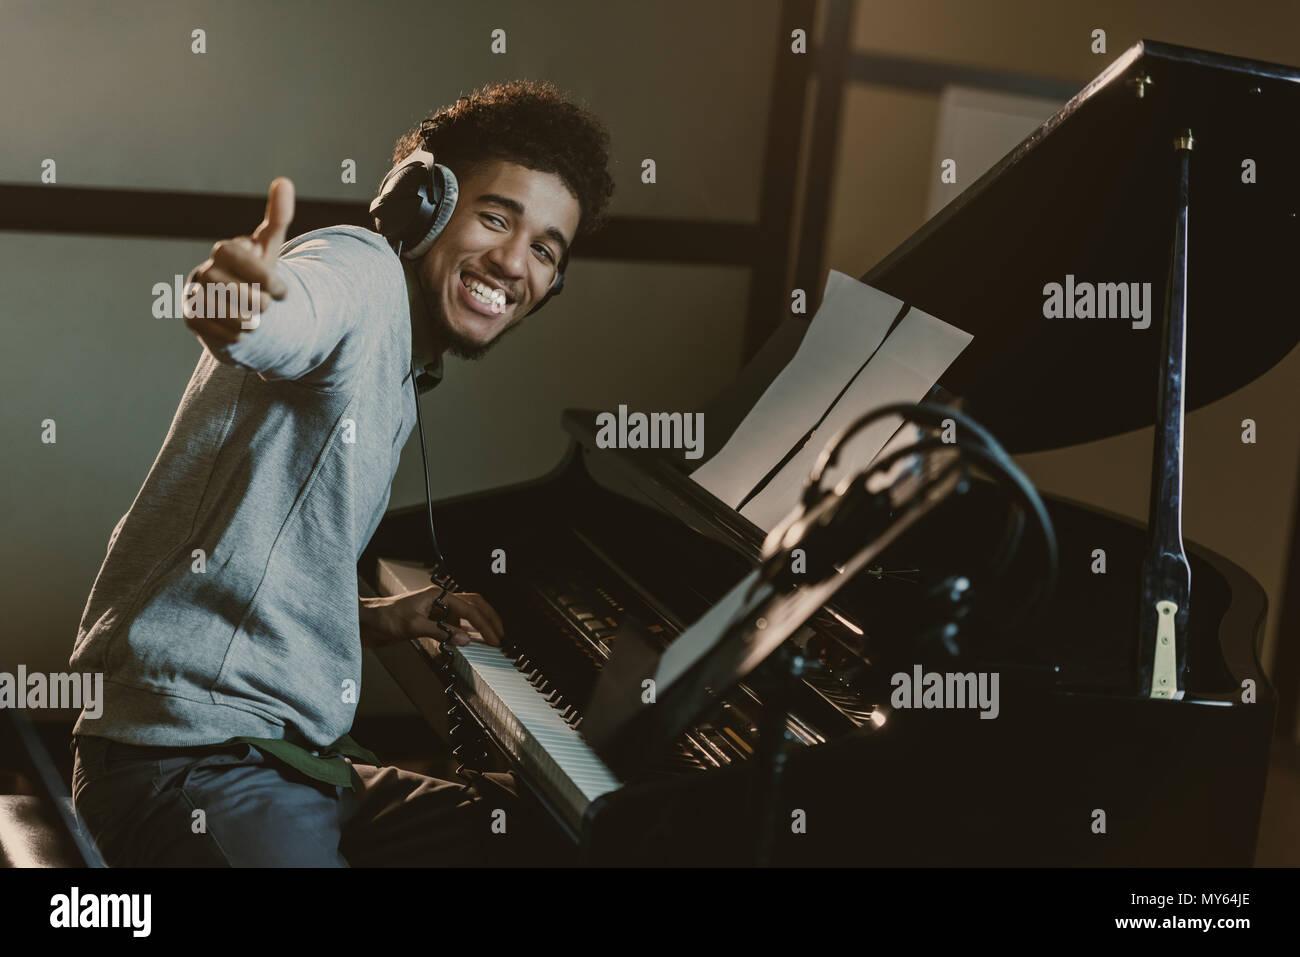 Feliz joven pianista mostrando pulgar arriba Imagen De Stock